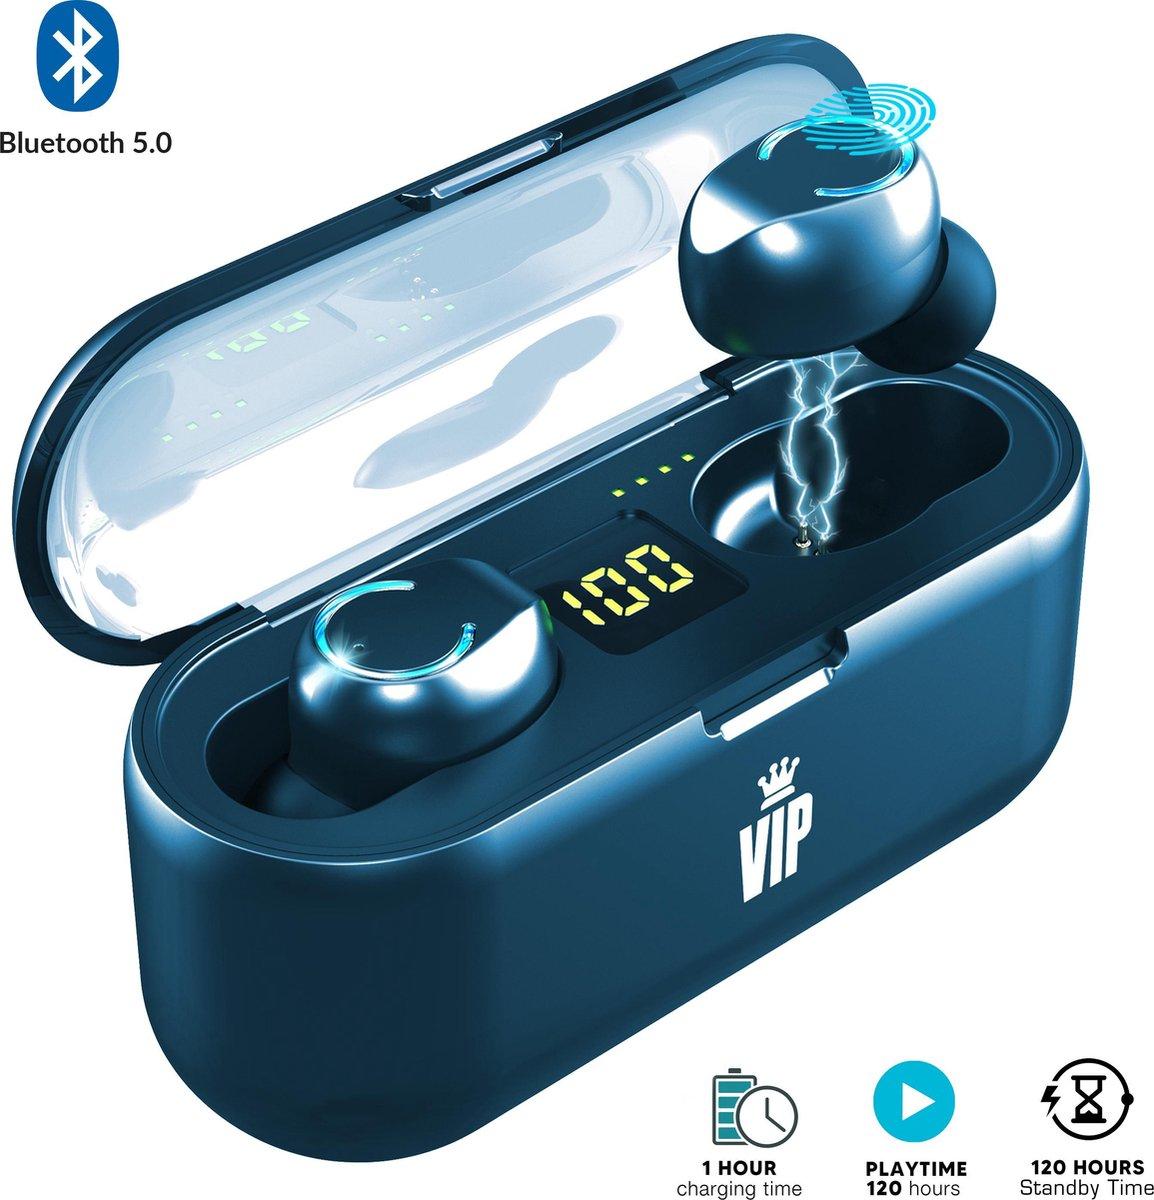 VIP Draadloze Oordopjes Bluetooth 5.0 Wireless Earbuds met Display – Oplaadcase – Waterproof oortjes – Samsung / Iphone / Universeel